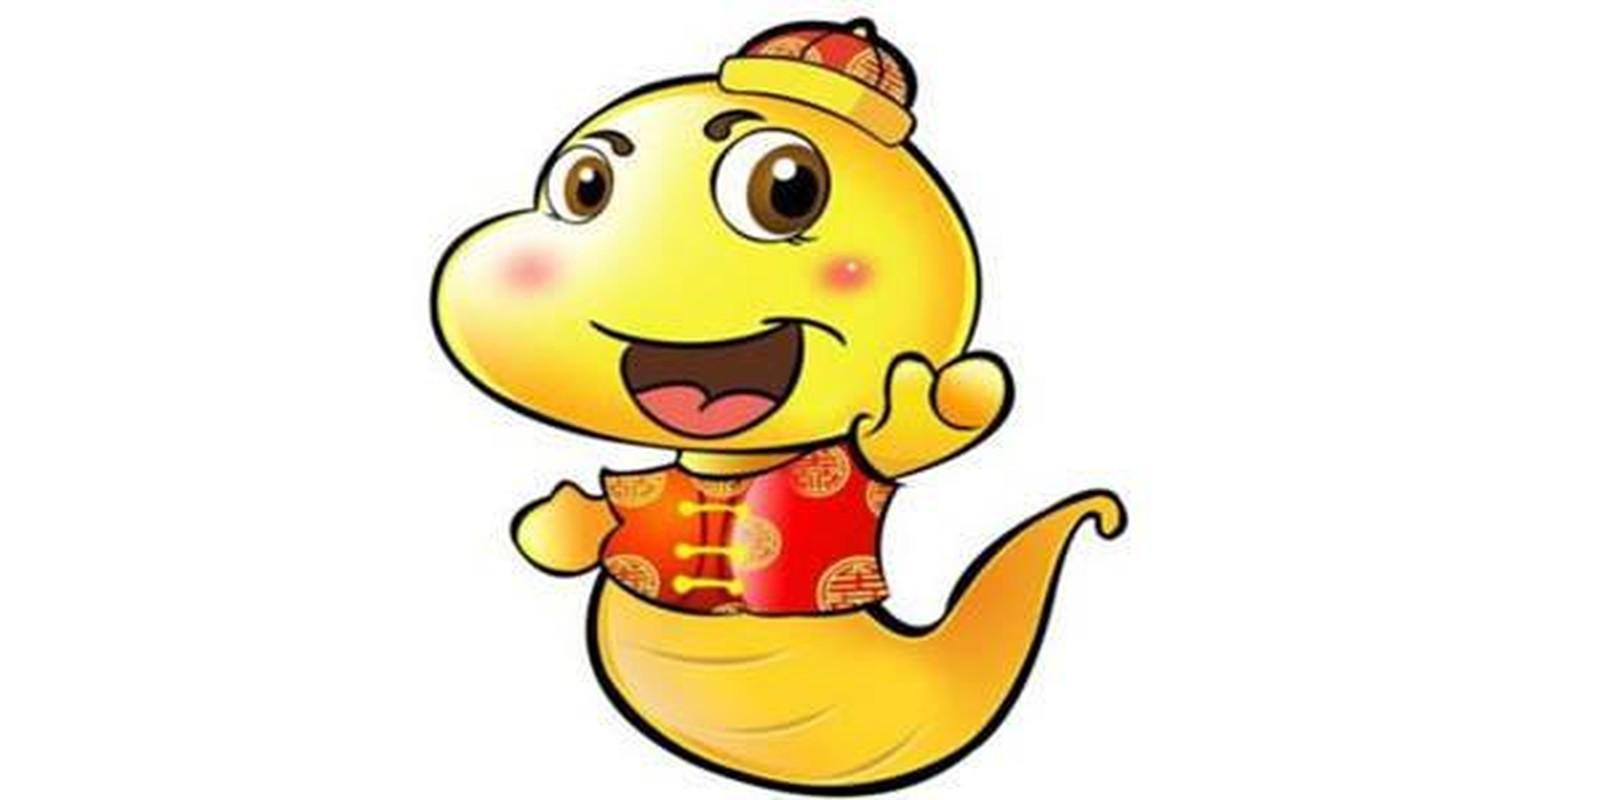 Du doan nam Tan Suu 2021 cho nguoi tuoi Ty: Tai loc am am keo den-Hinh-3